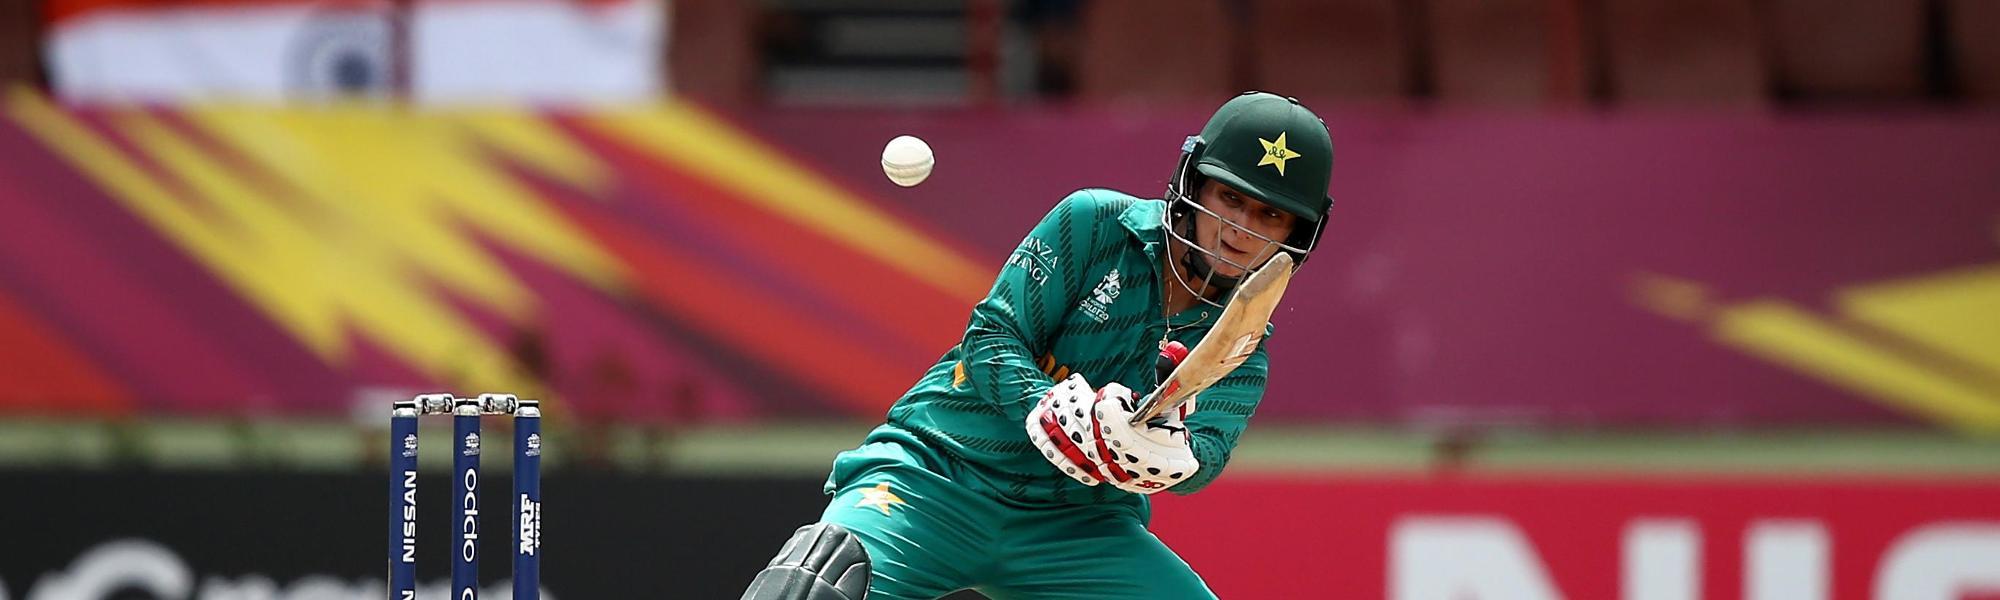 Bismah Mahroof of Pakistan bats during the ICC Women's World T20 2018 match between India and Pakistan at Guyana National Stadium on November 11, 2018 in Providence, Guyana.